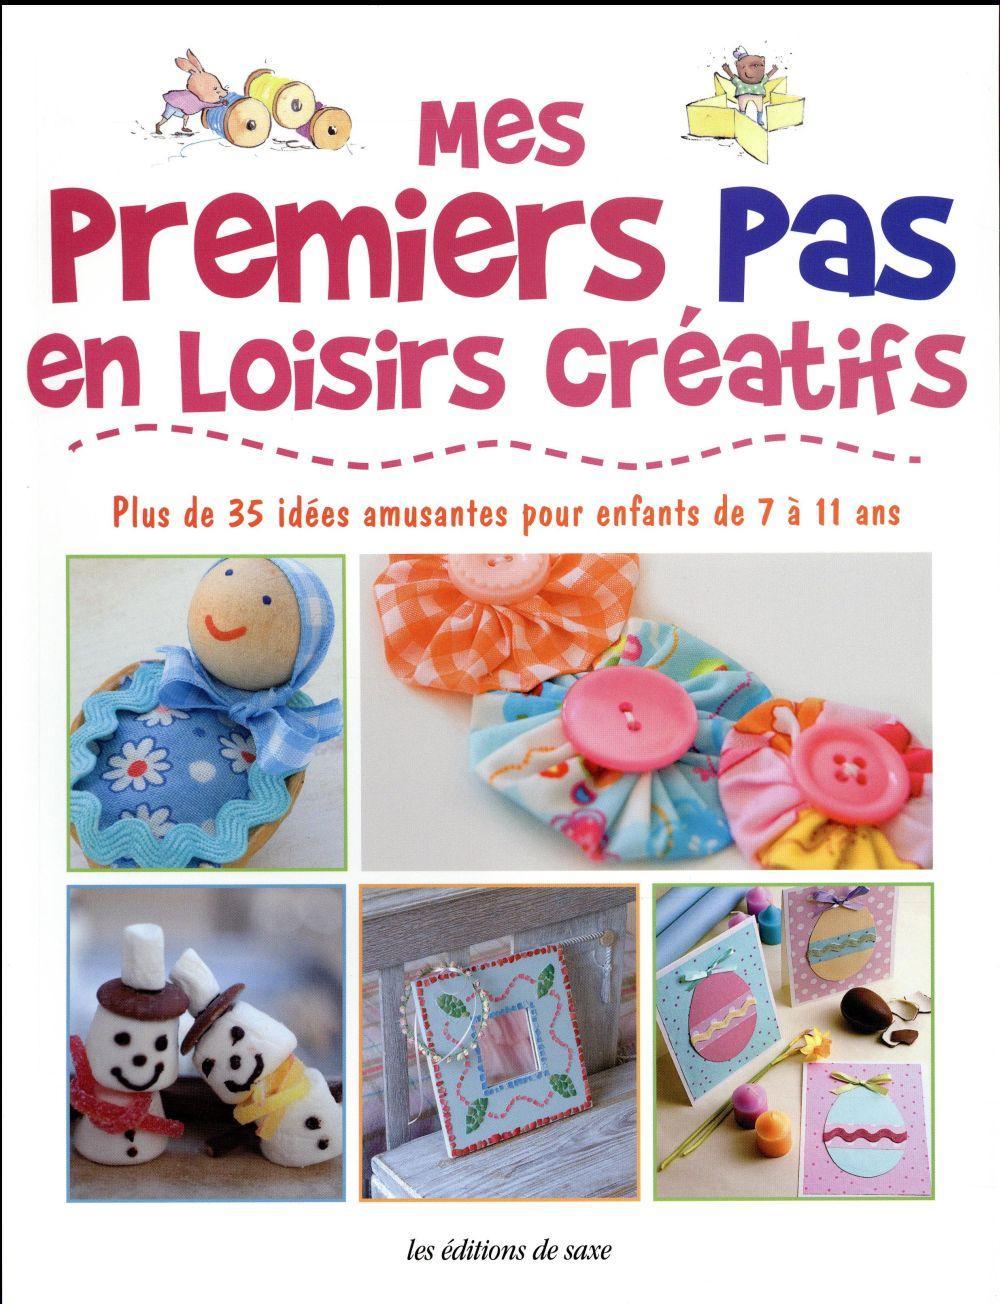 Akass susan susan akass france loisirs suisse - Loisirs creatifs pour enfants ...